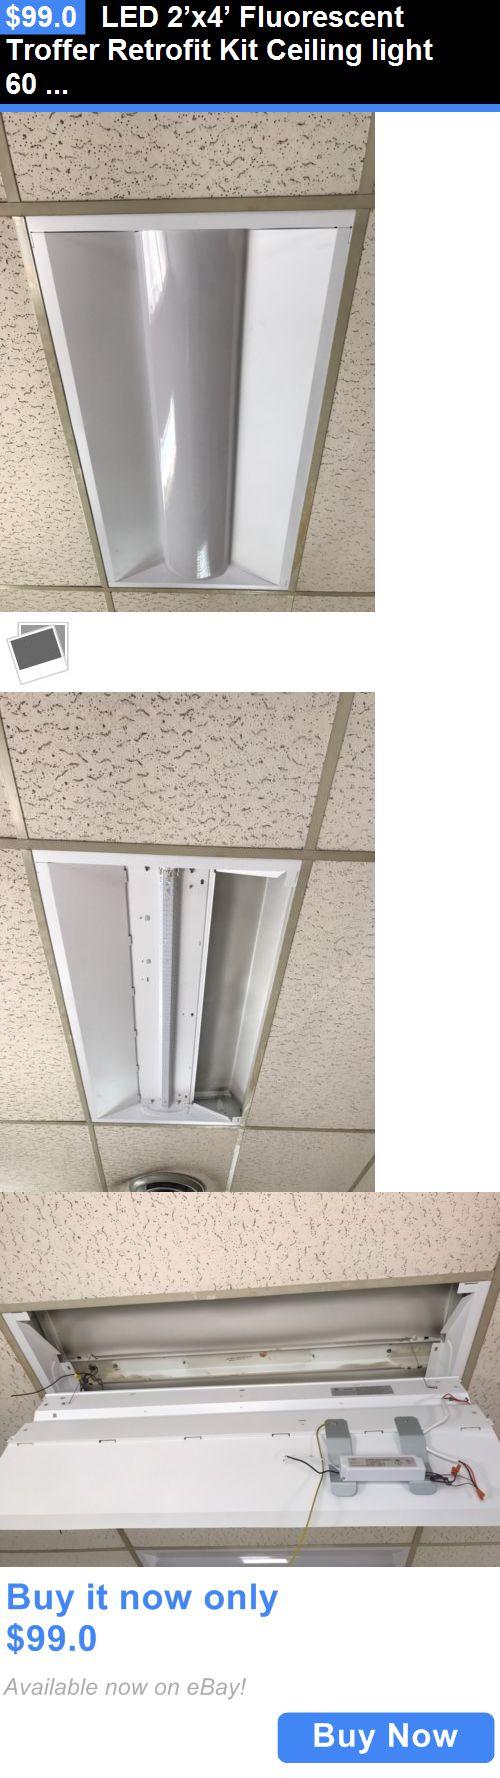 9 best led high bay light images on pinterest bay lights high bay business commercial led 2x4 fluorescent troffer retrofit kit ceiling light 60 watt mozeypictures Choice Image